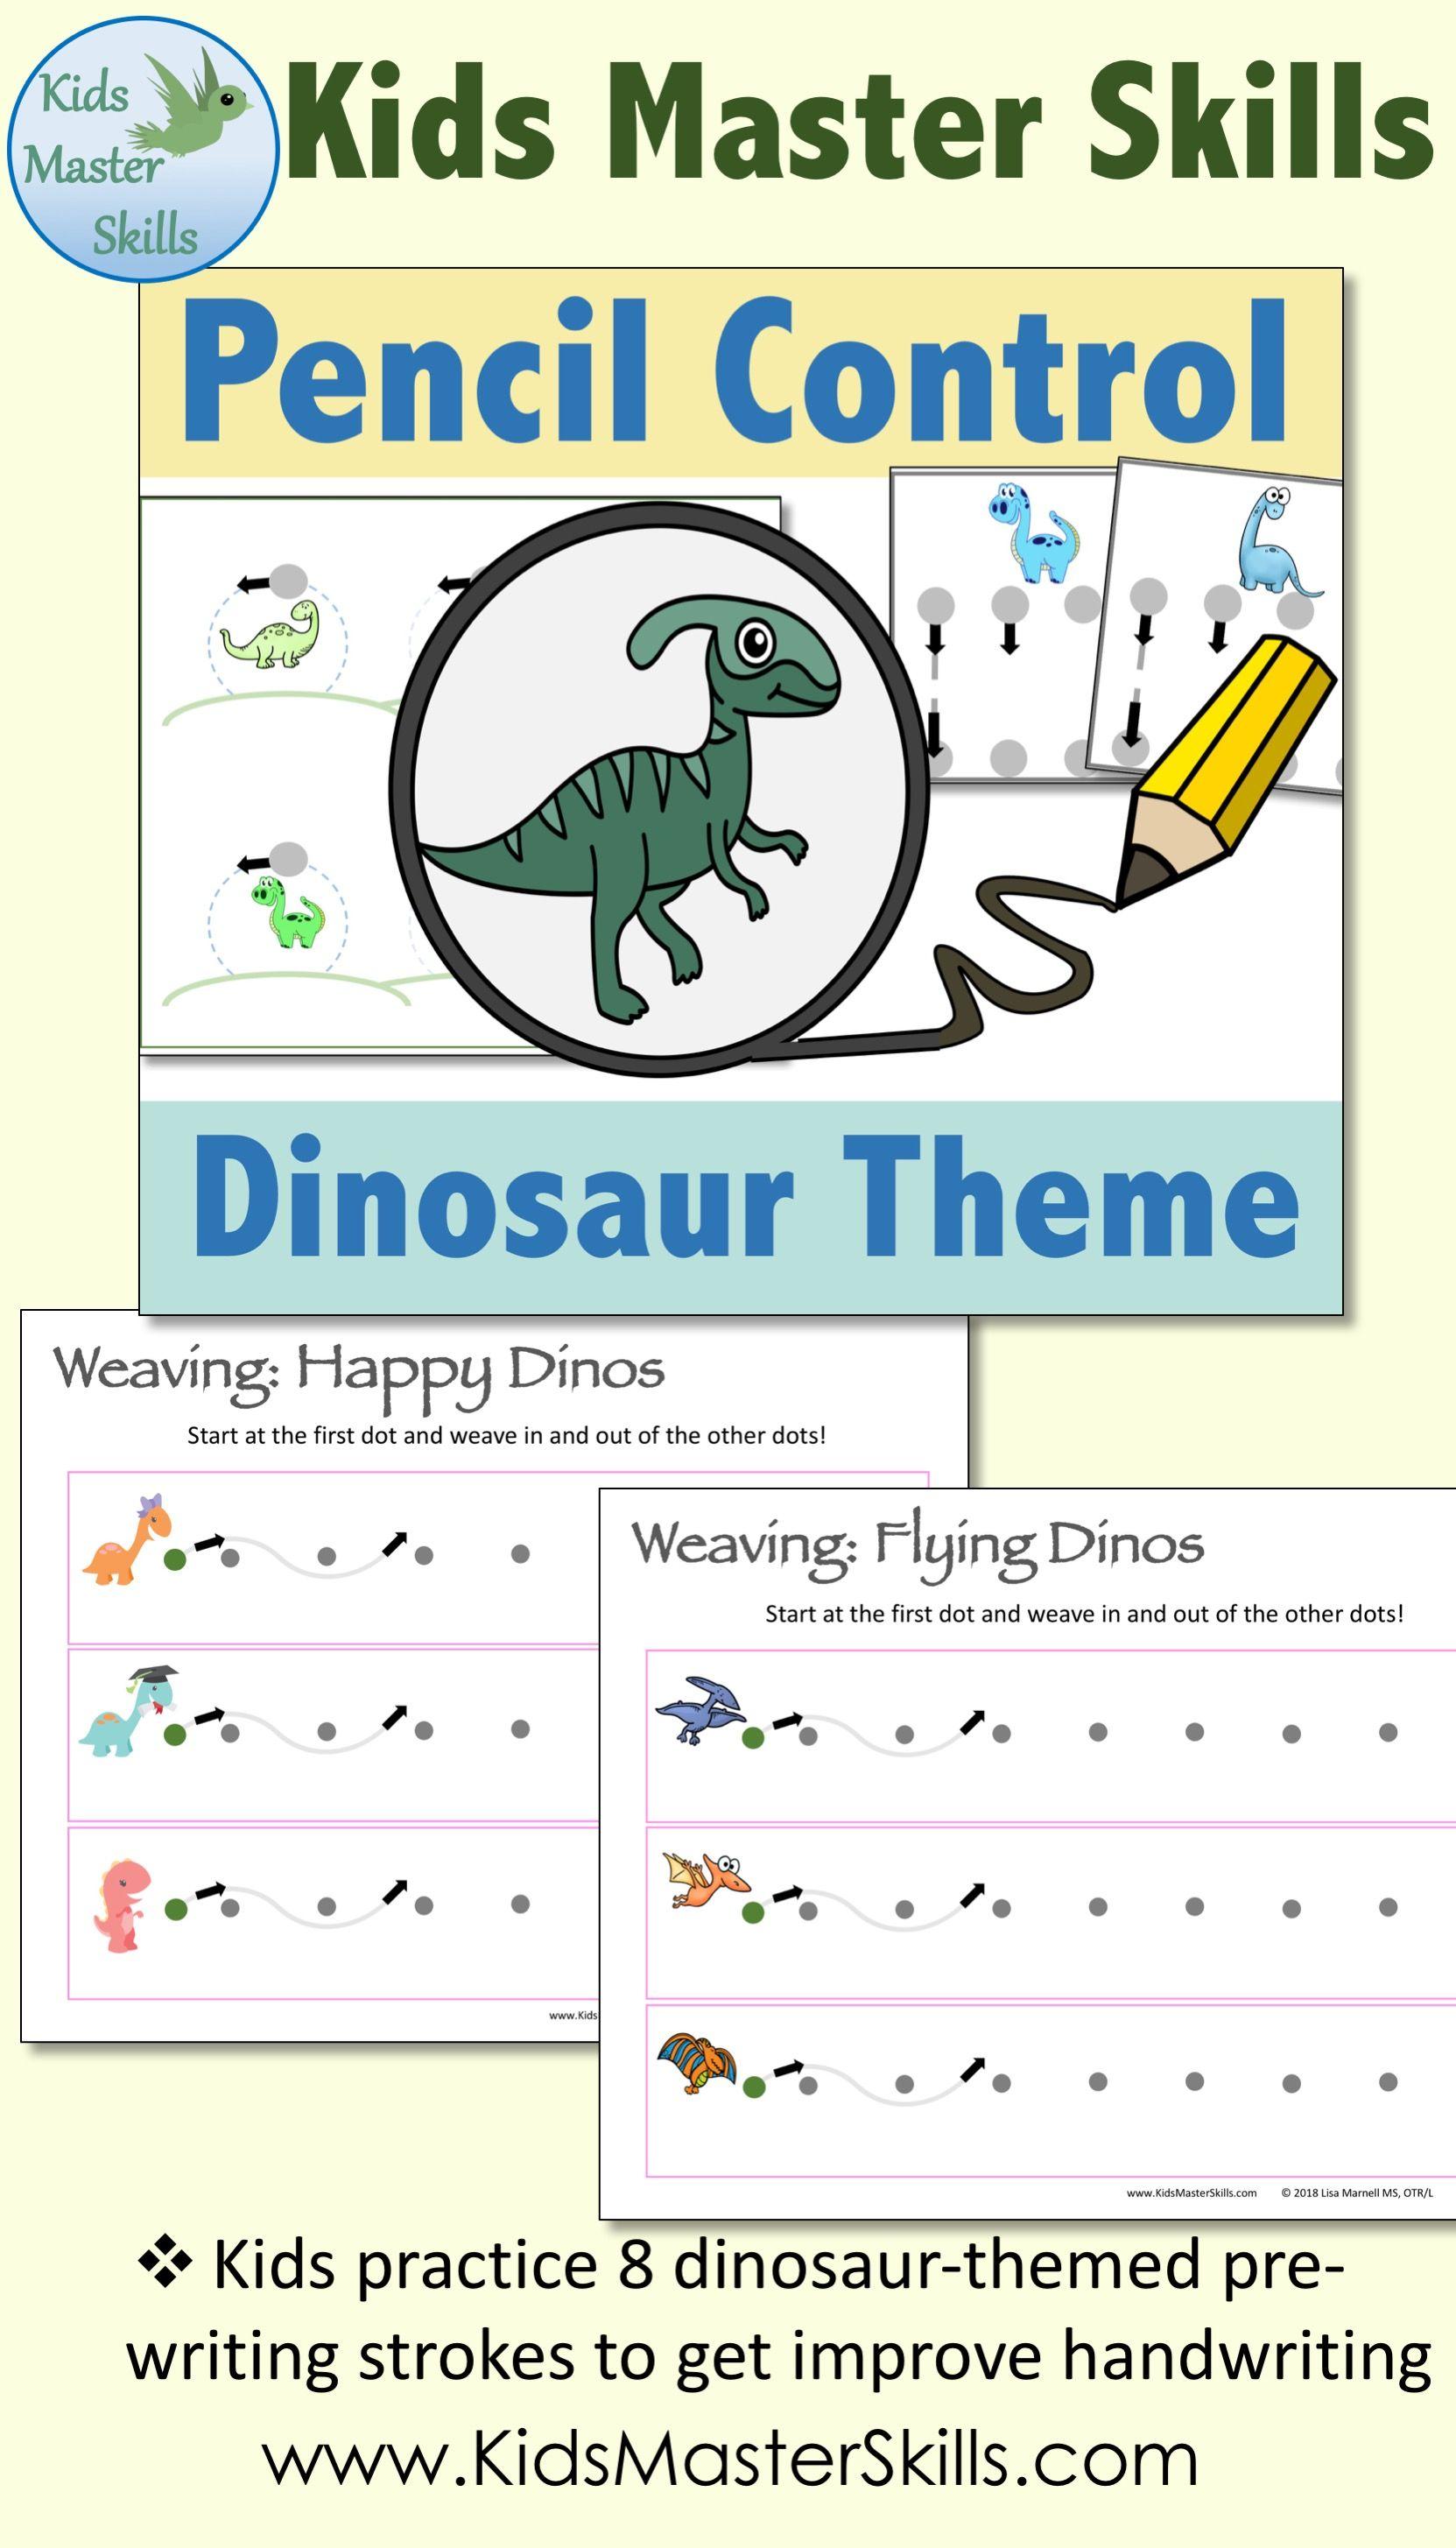 Pencil Control Dinosaurs